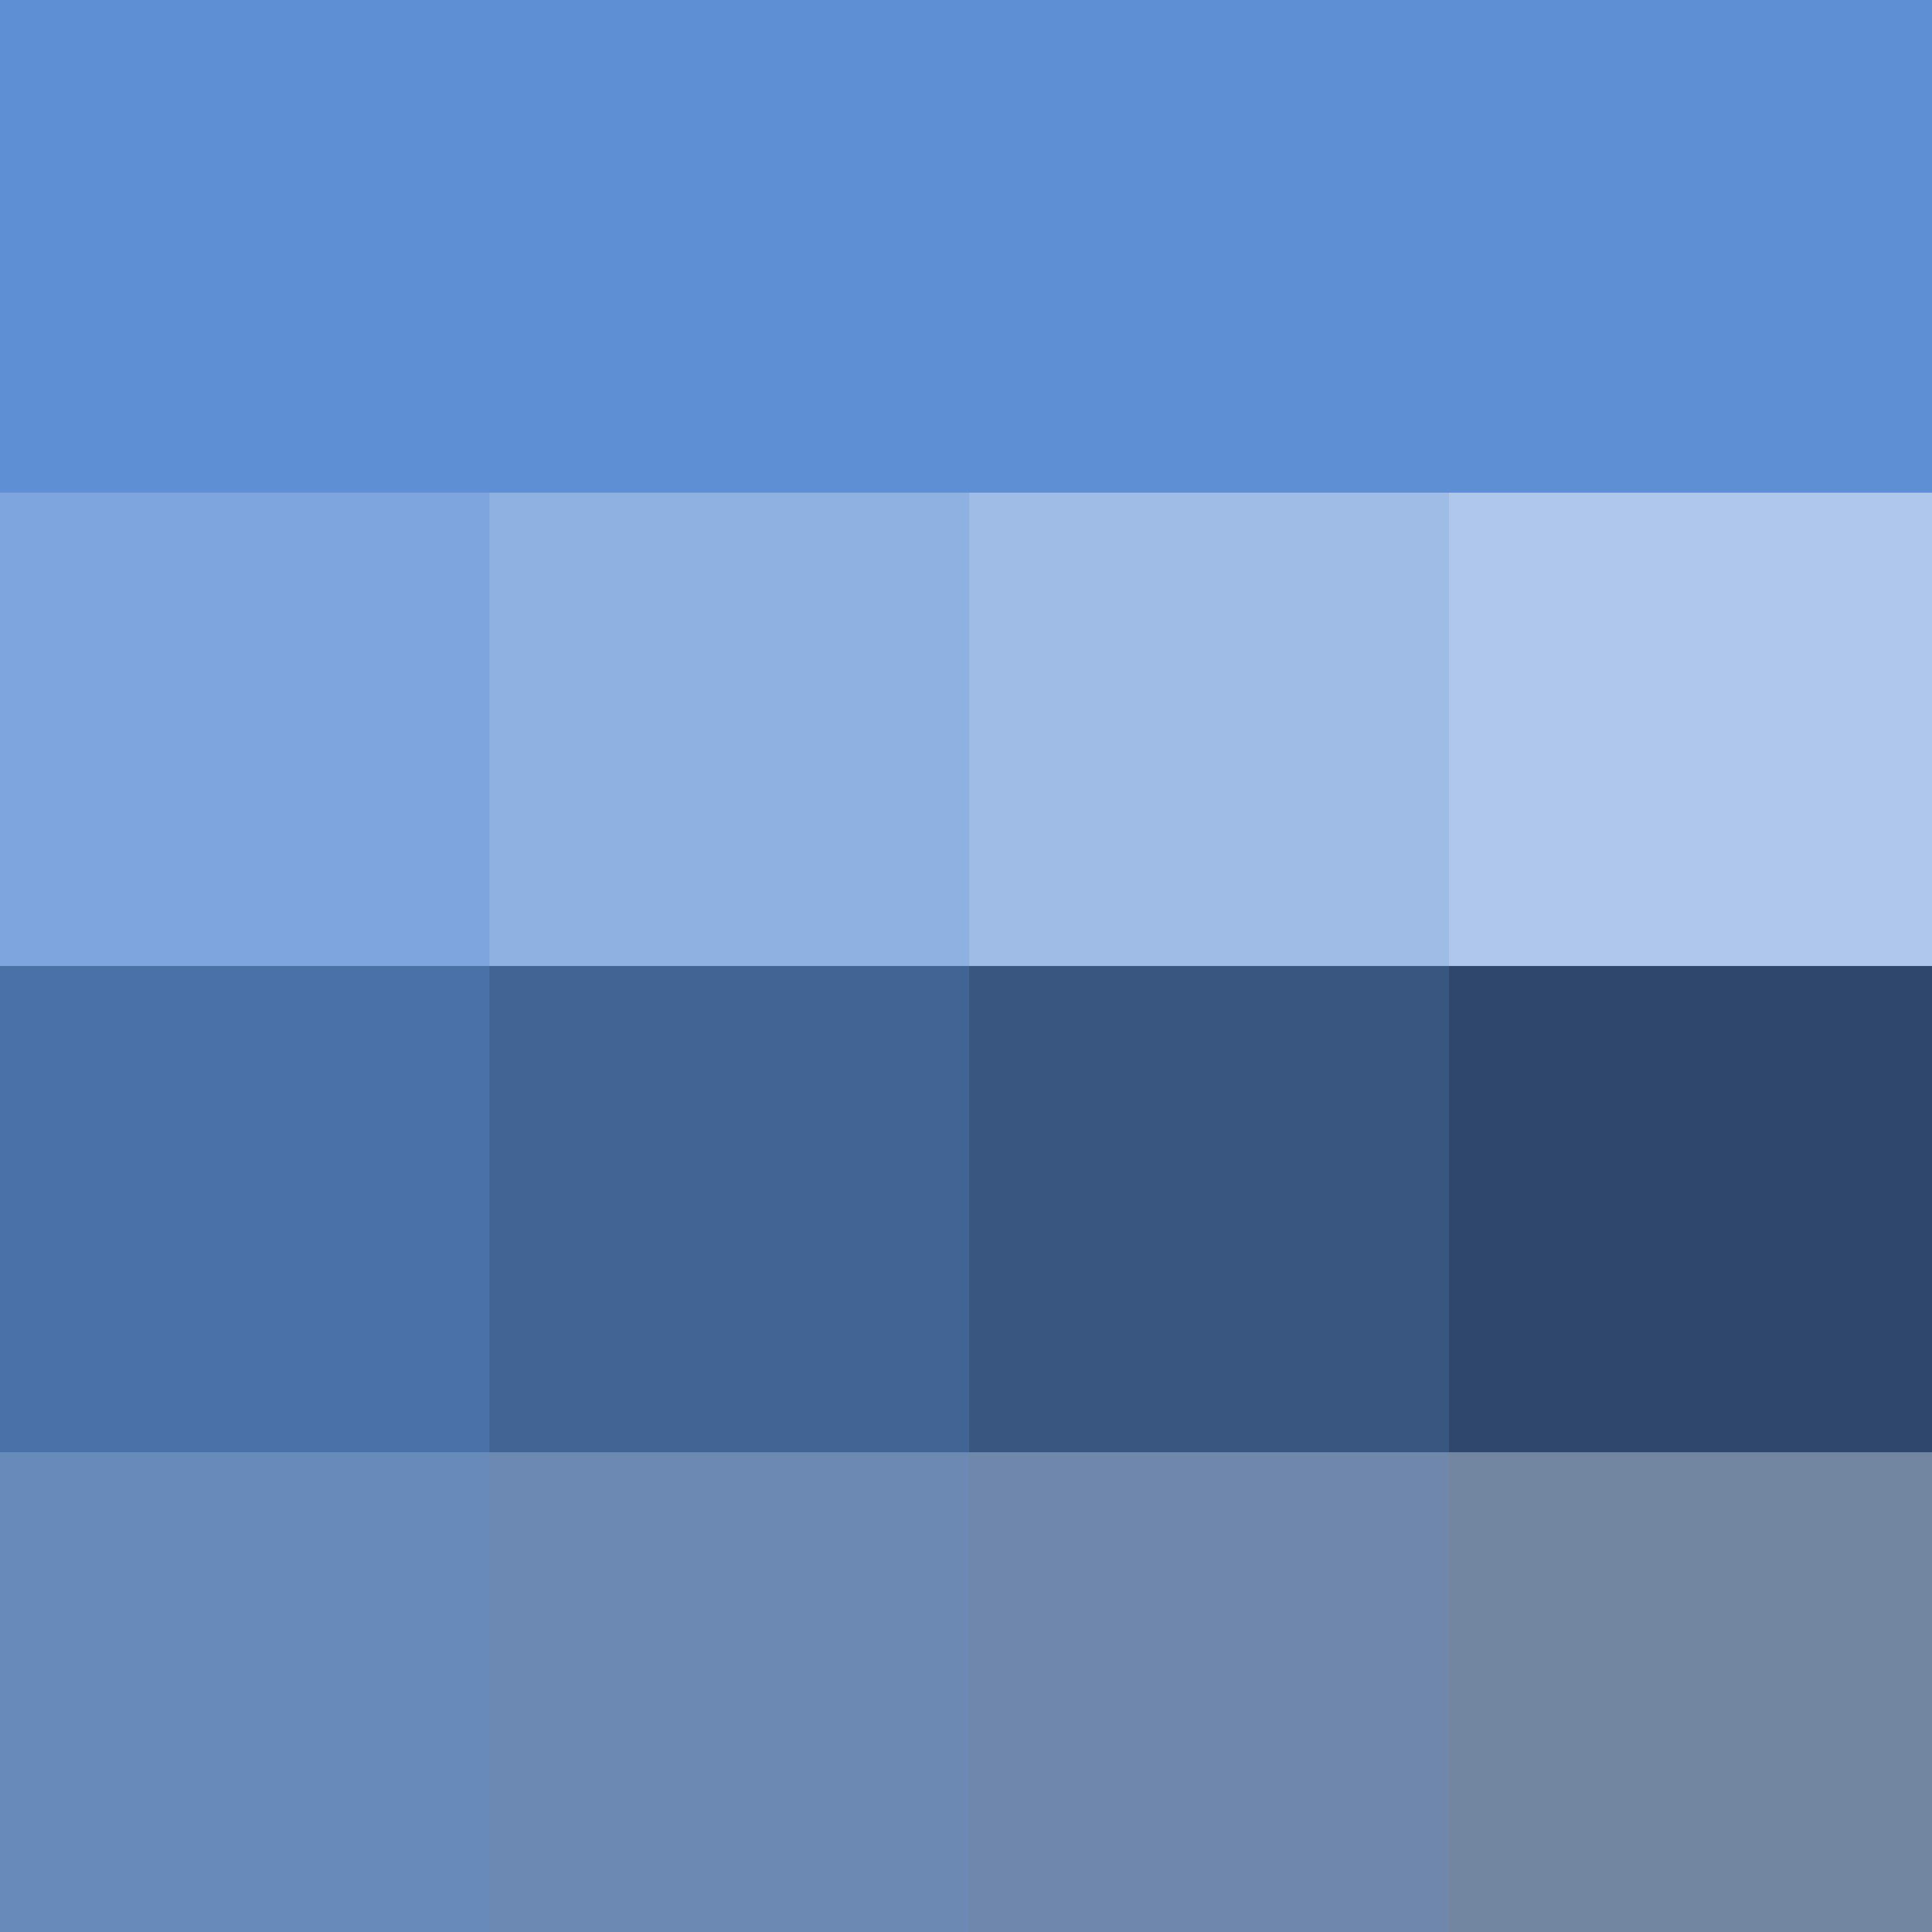 pantone azure blue - hue ( pure color ) with tints (hue + white